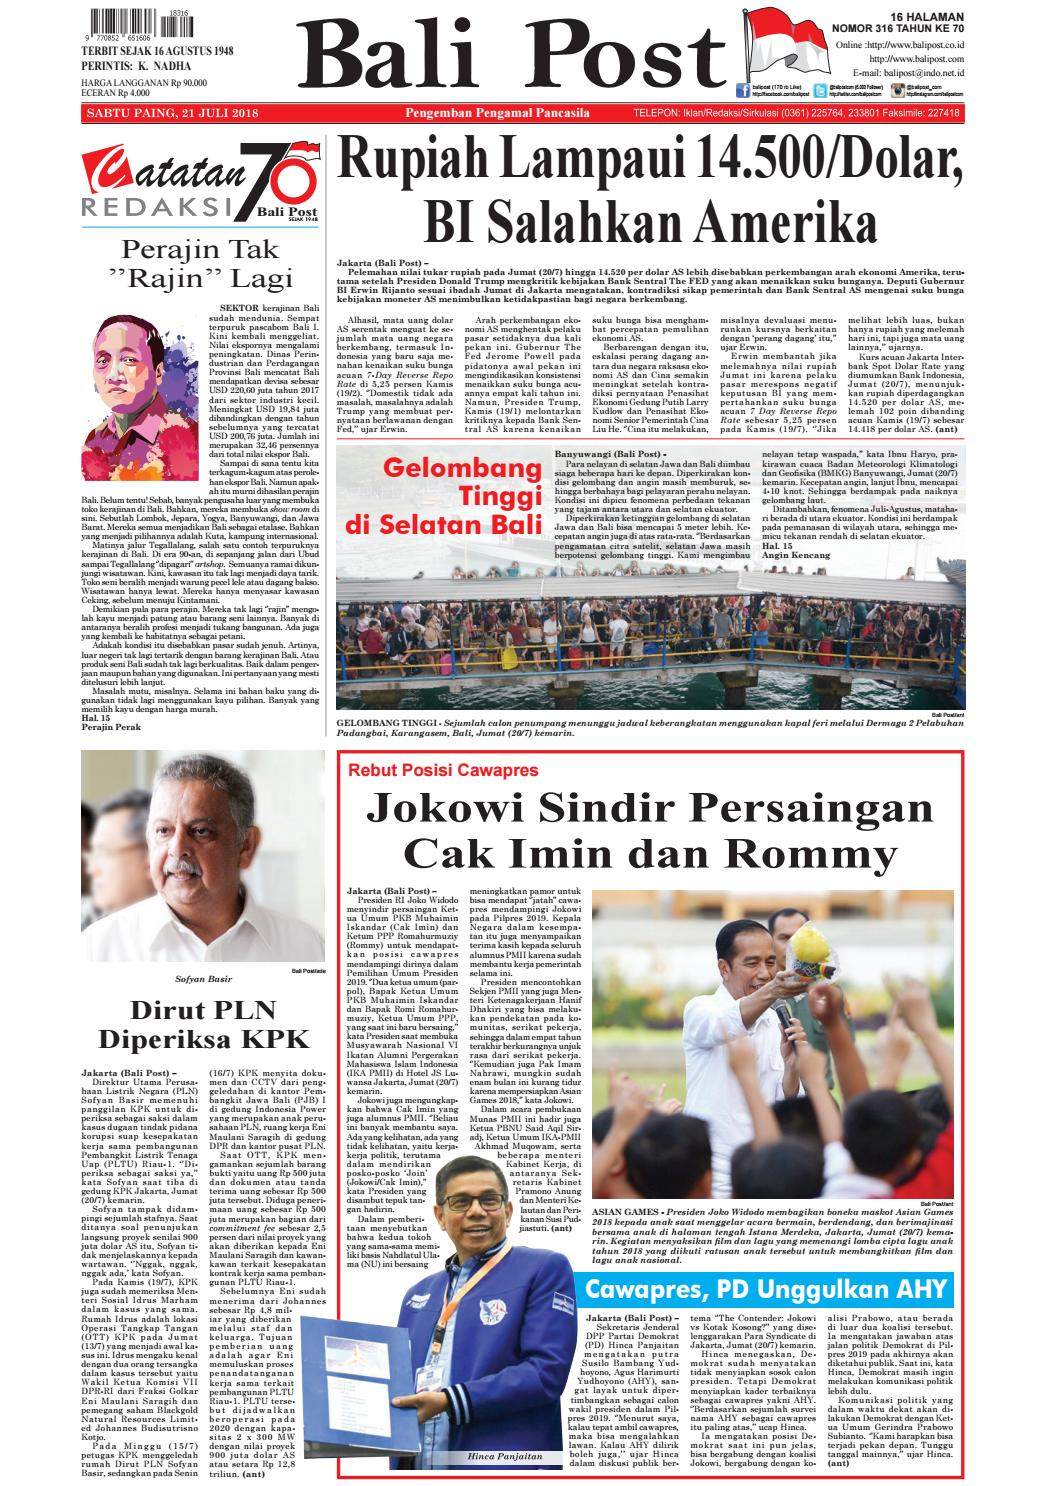 Edisi Sabtu 21 Juli 2018 Balipostcom By E Paper Kmb Issuu Produk Ukm Bumn Bakso Ikan Tuna Khas Ambon